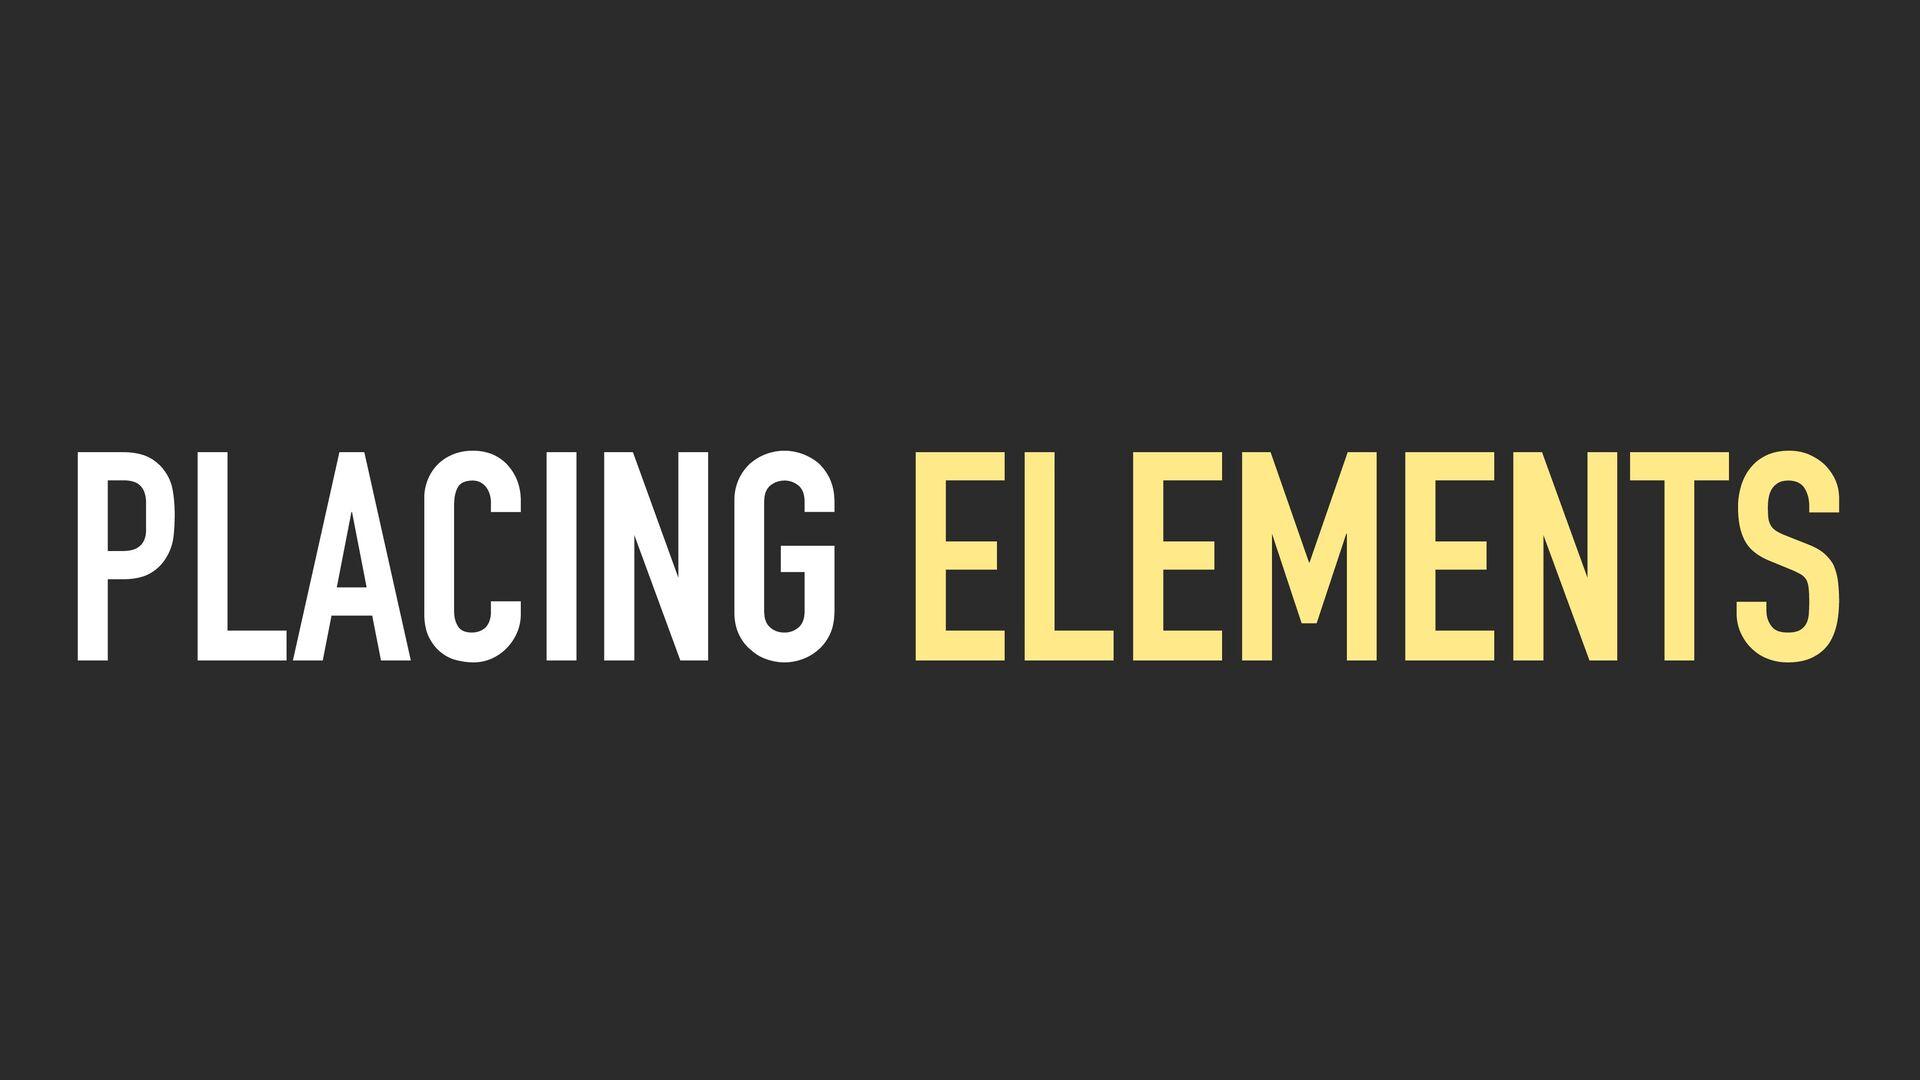 PLACING ELEMENTS